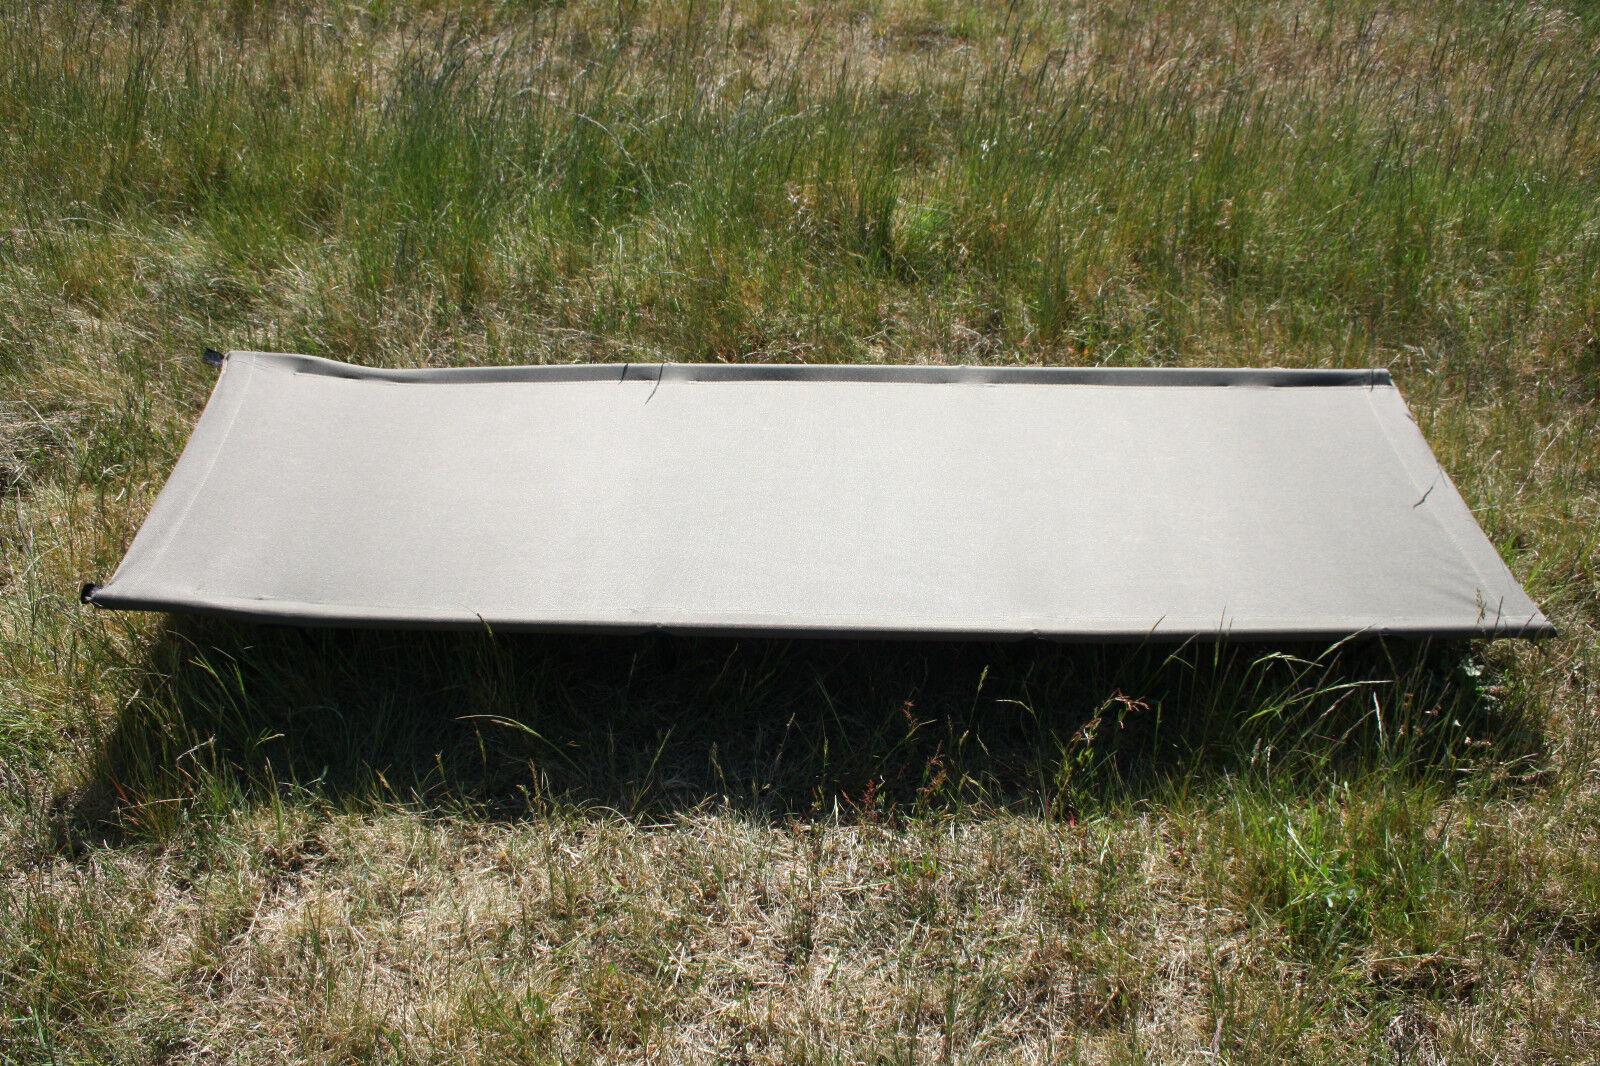 Zeltliege lit de camp lit M metallgeschtell pêcher camping tente couchage Olive